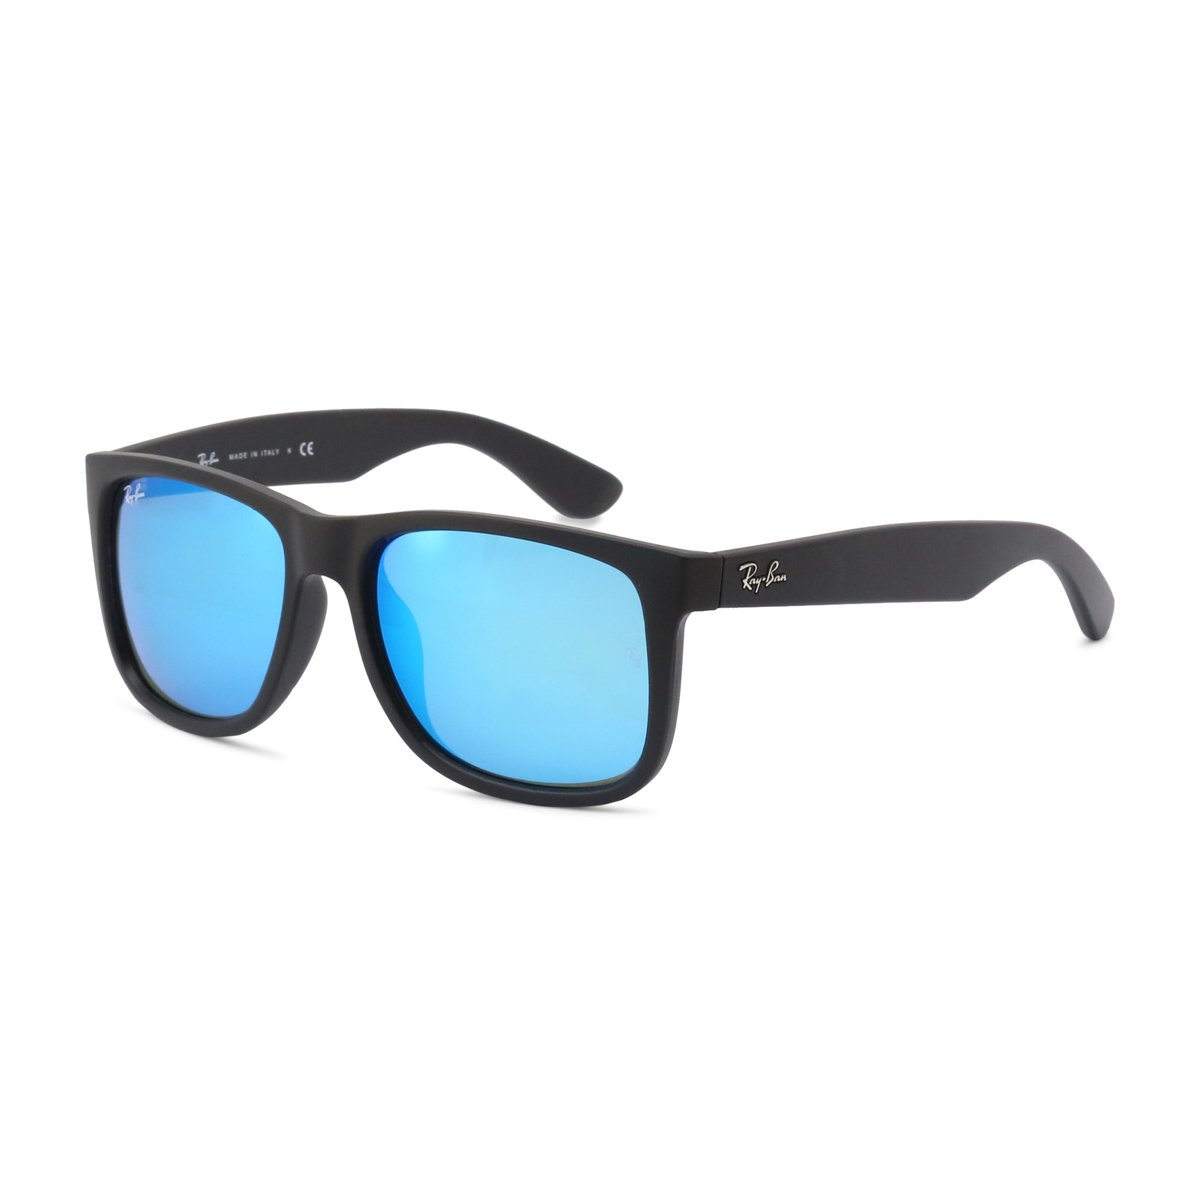 Ray-Ban Unisex Sunglasses Black 0RB4165F - black-1 NOSIZE